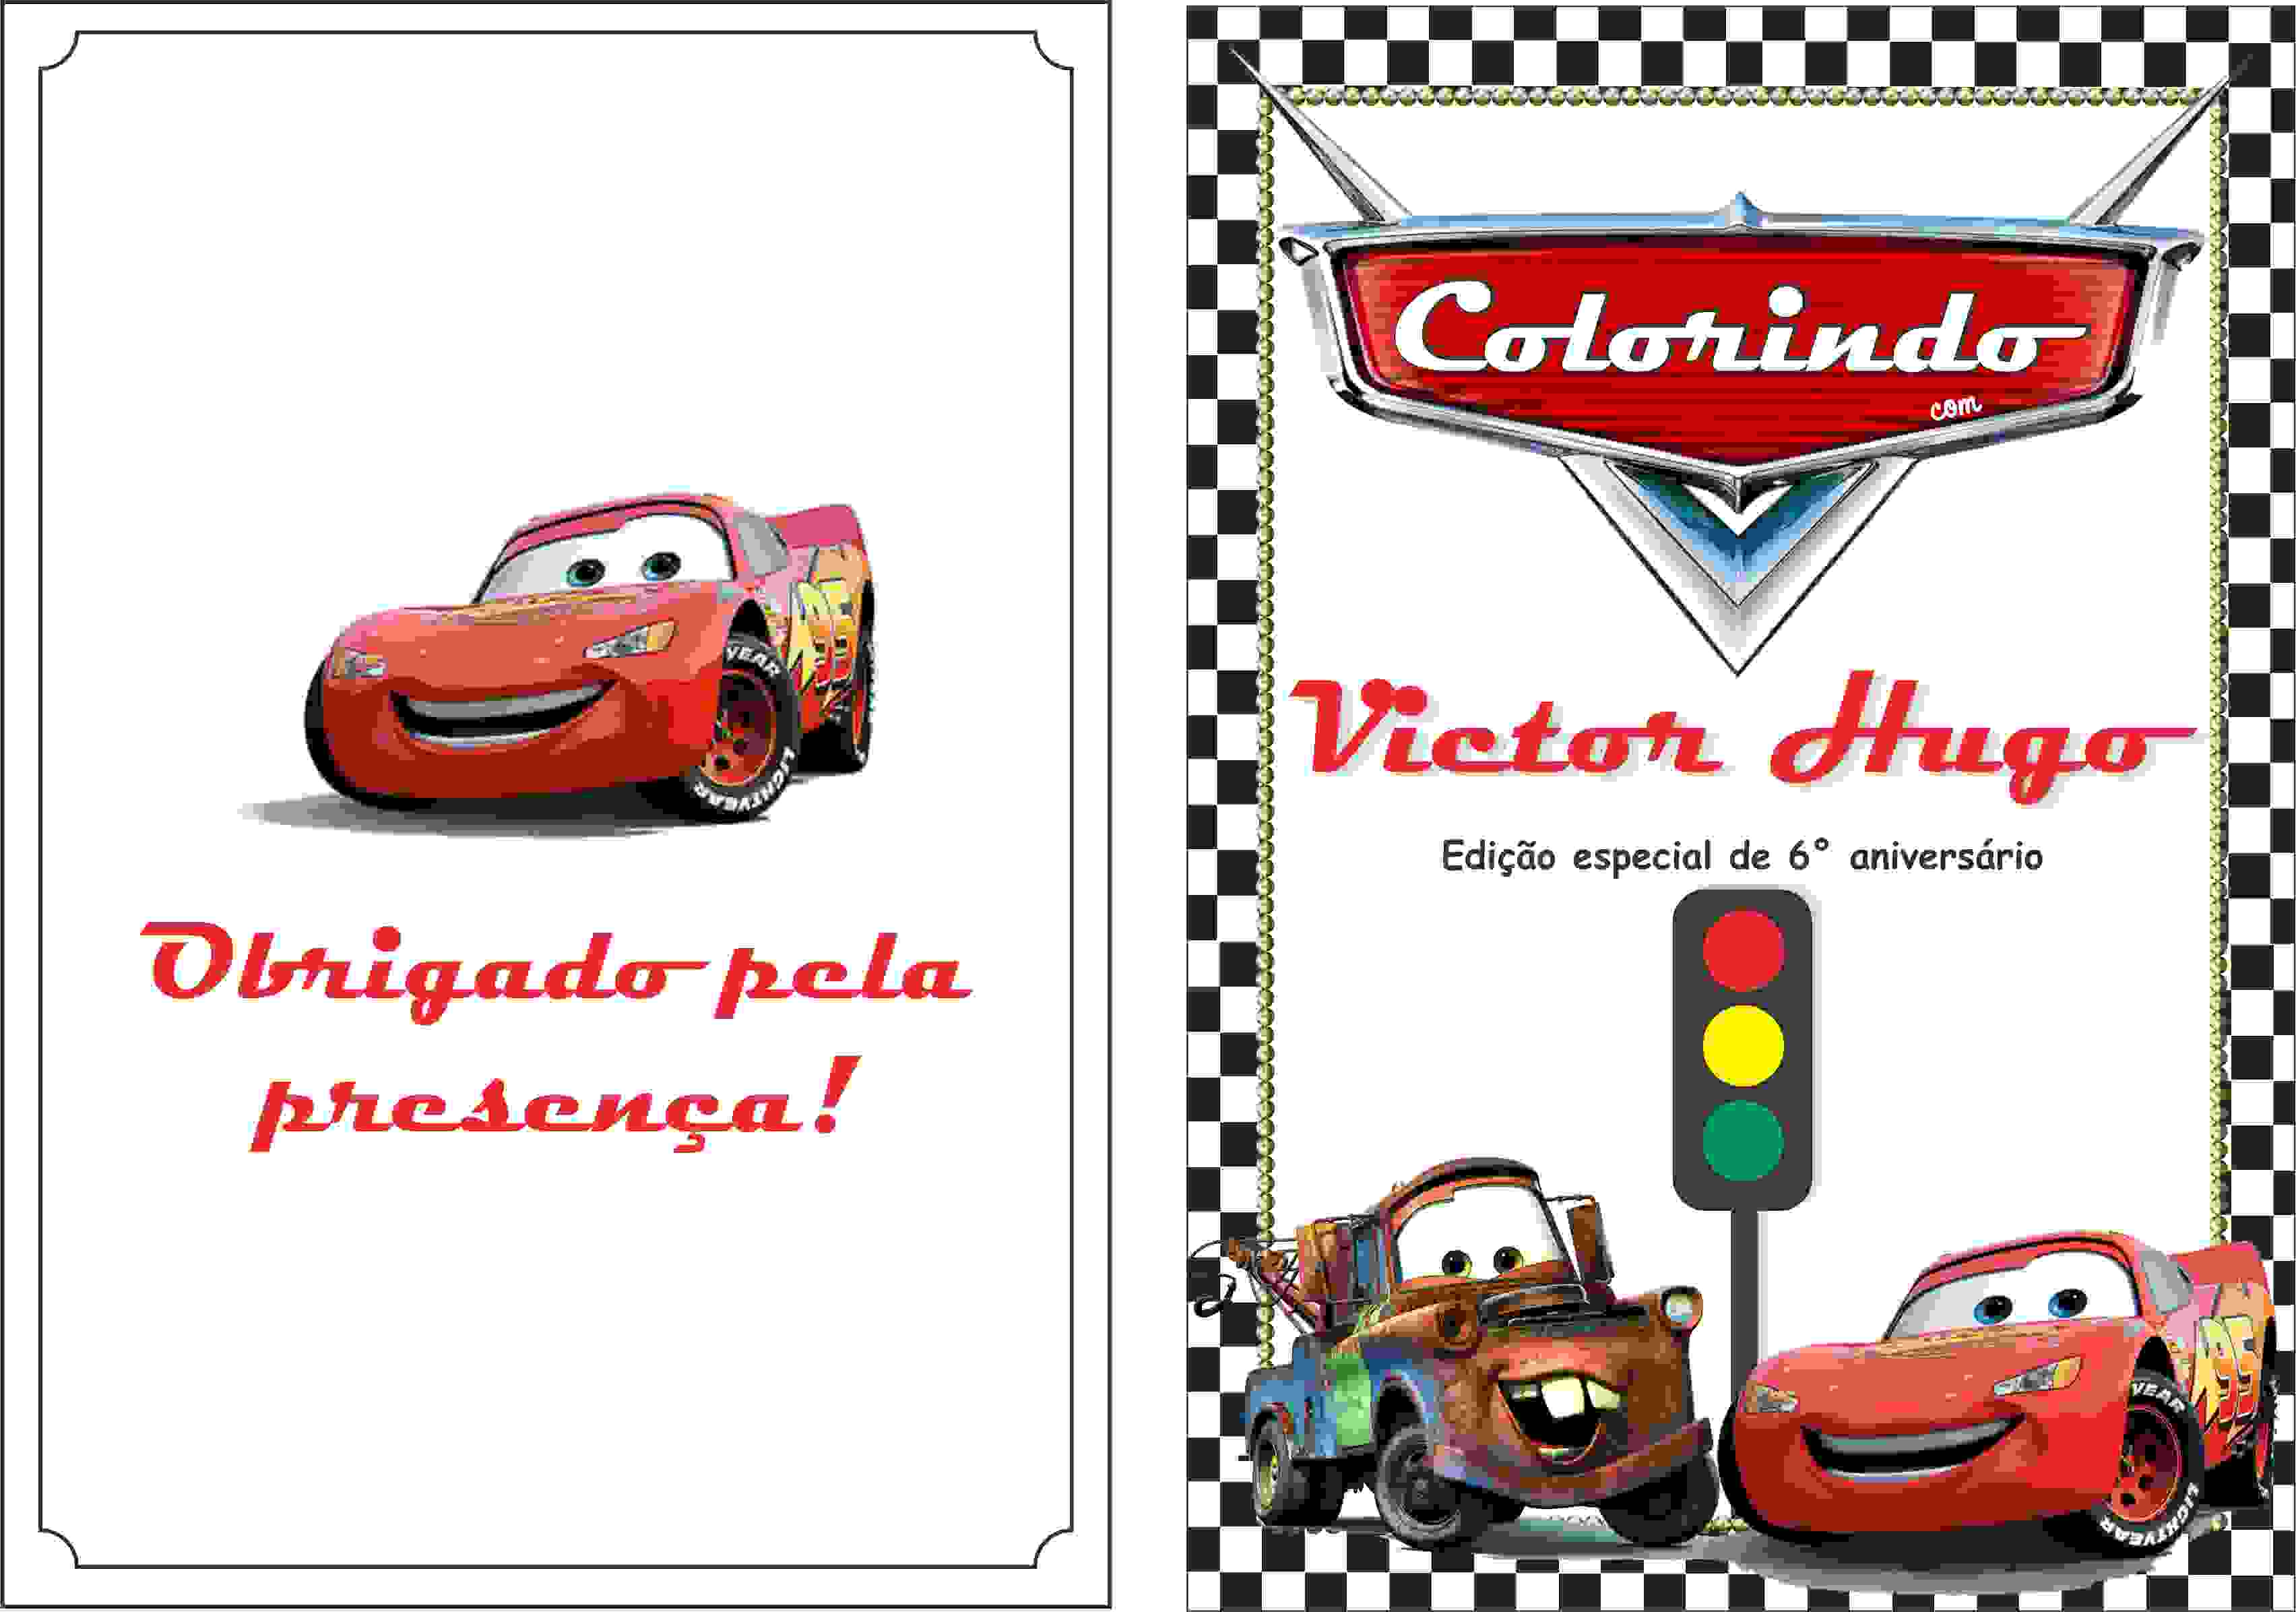 Carros Livro Para Colorir No Elo7 Beatriz Lisboa 4a8618